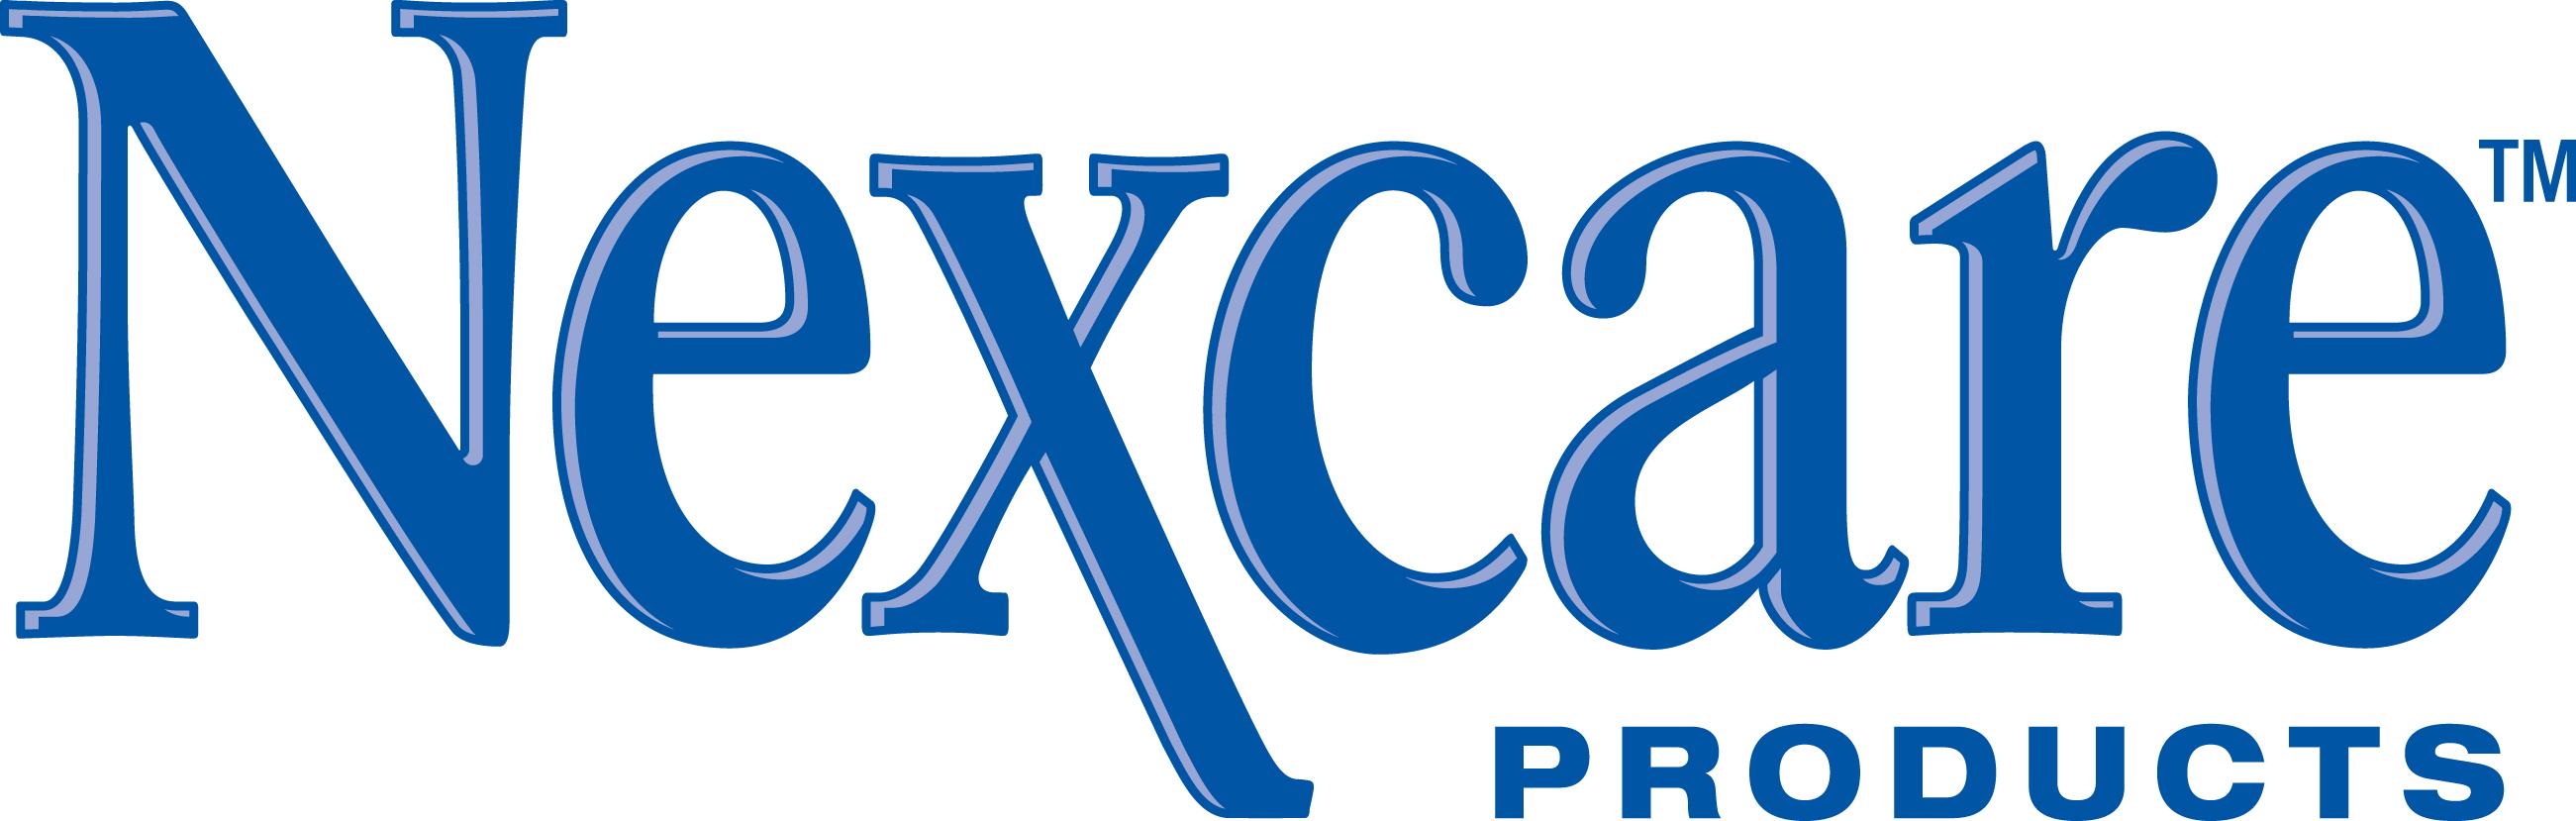 Nexcare coupon codes